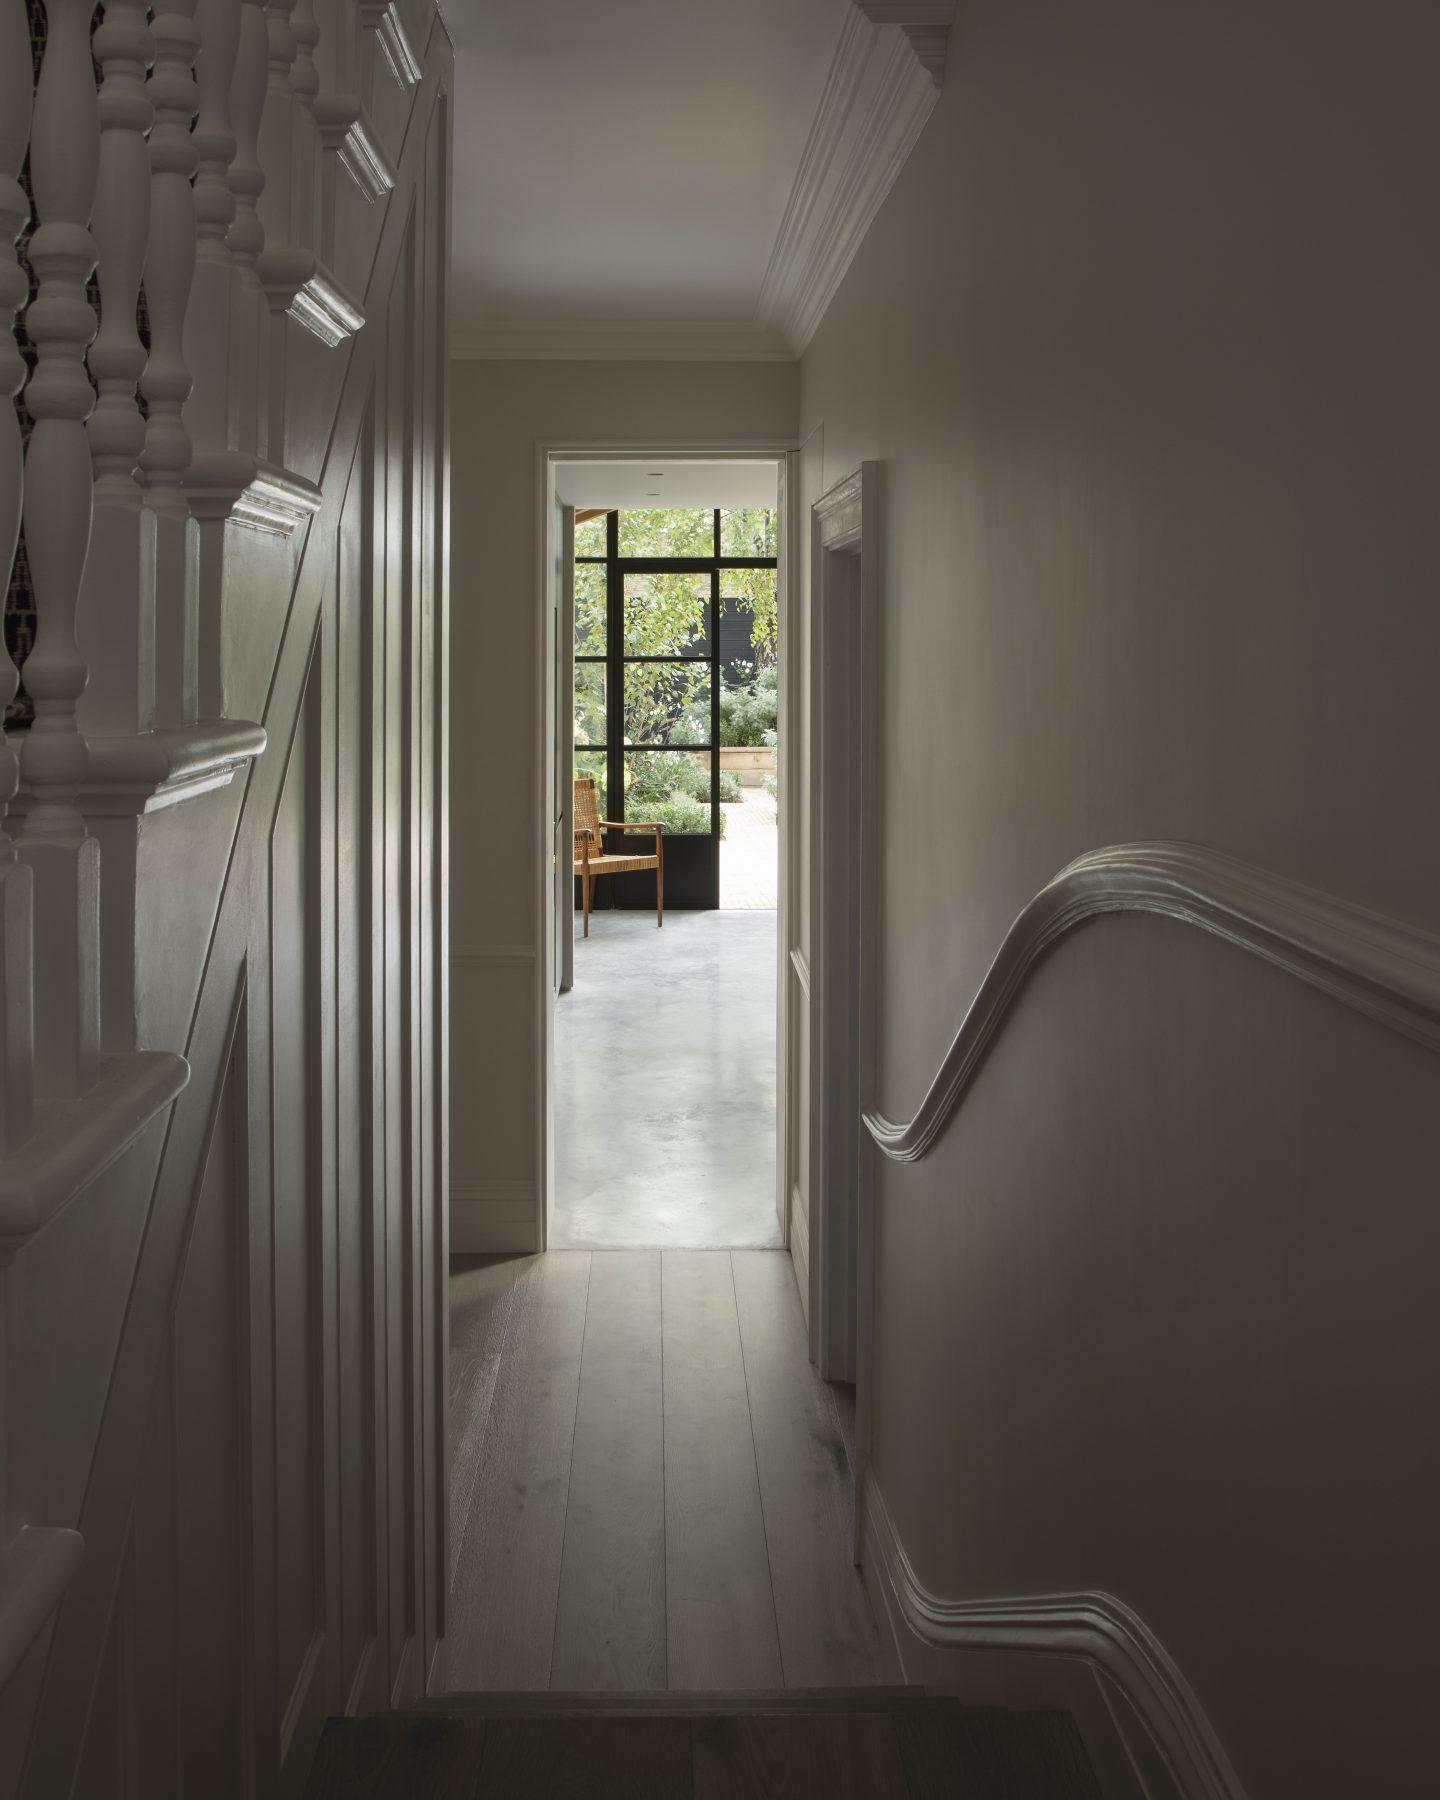 IGNANT-Architecture-WillGambleArchitects-BurntHouse-10